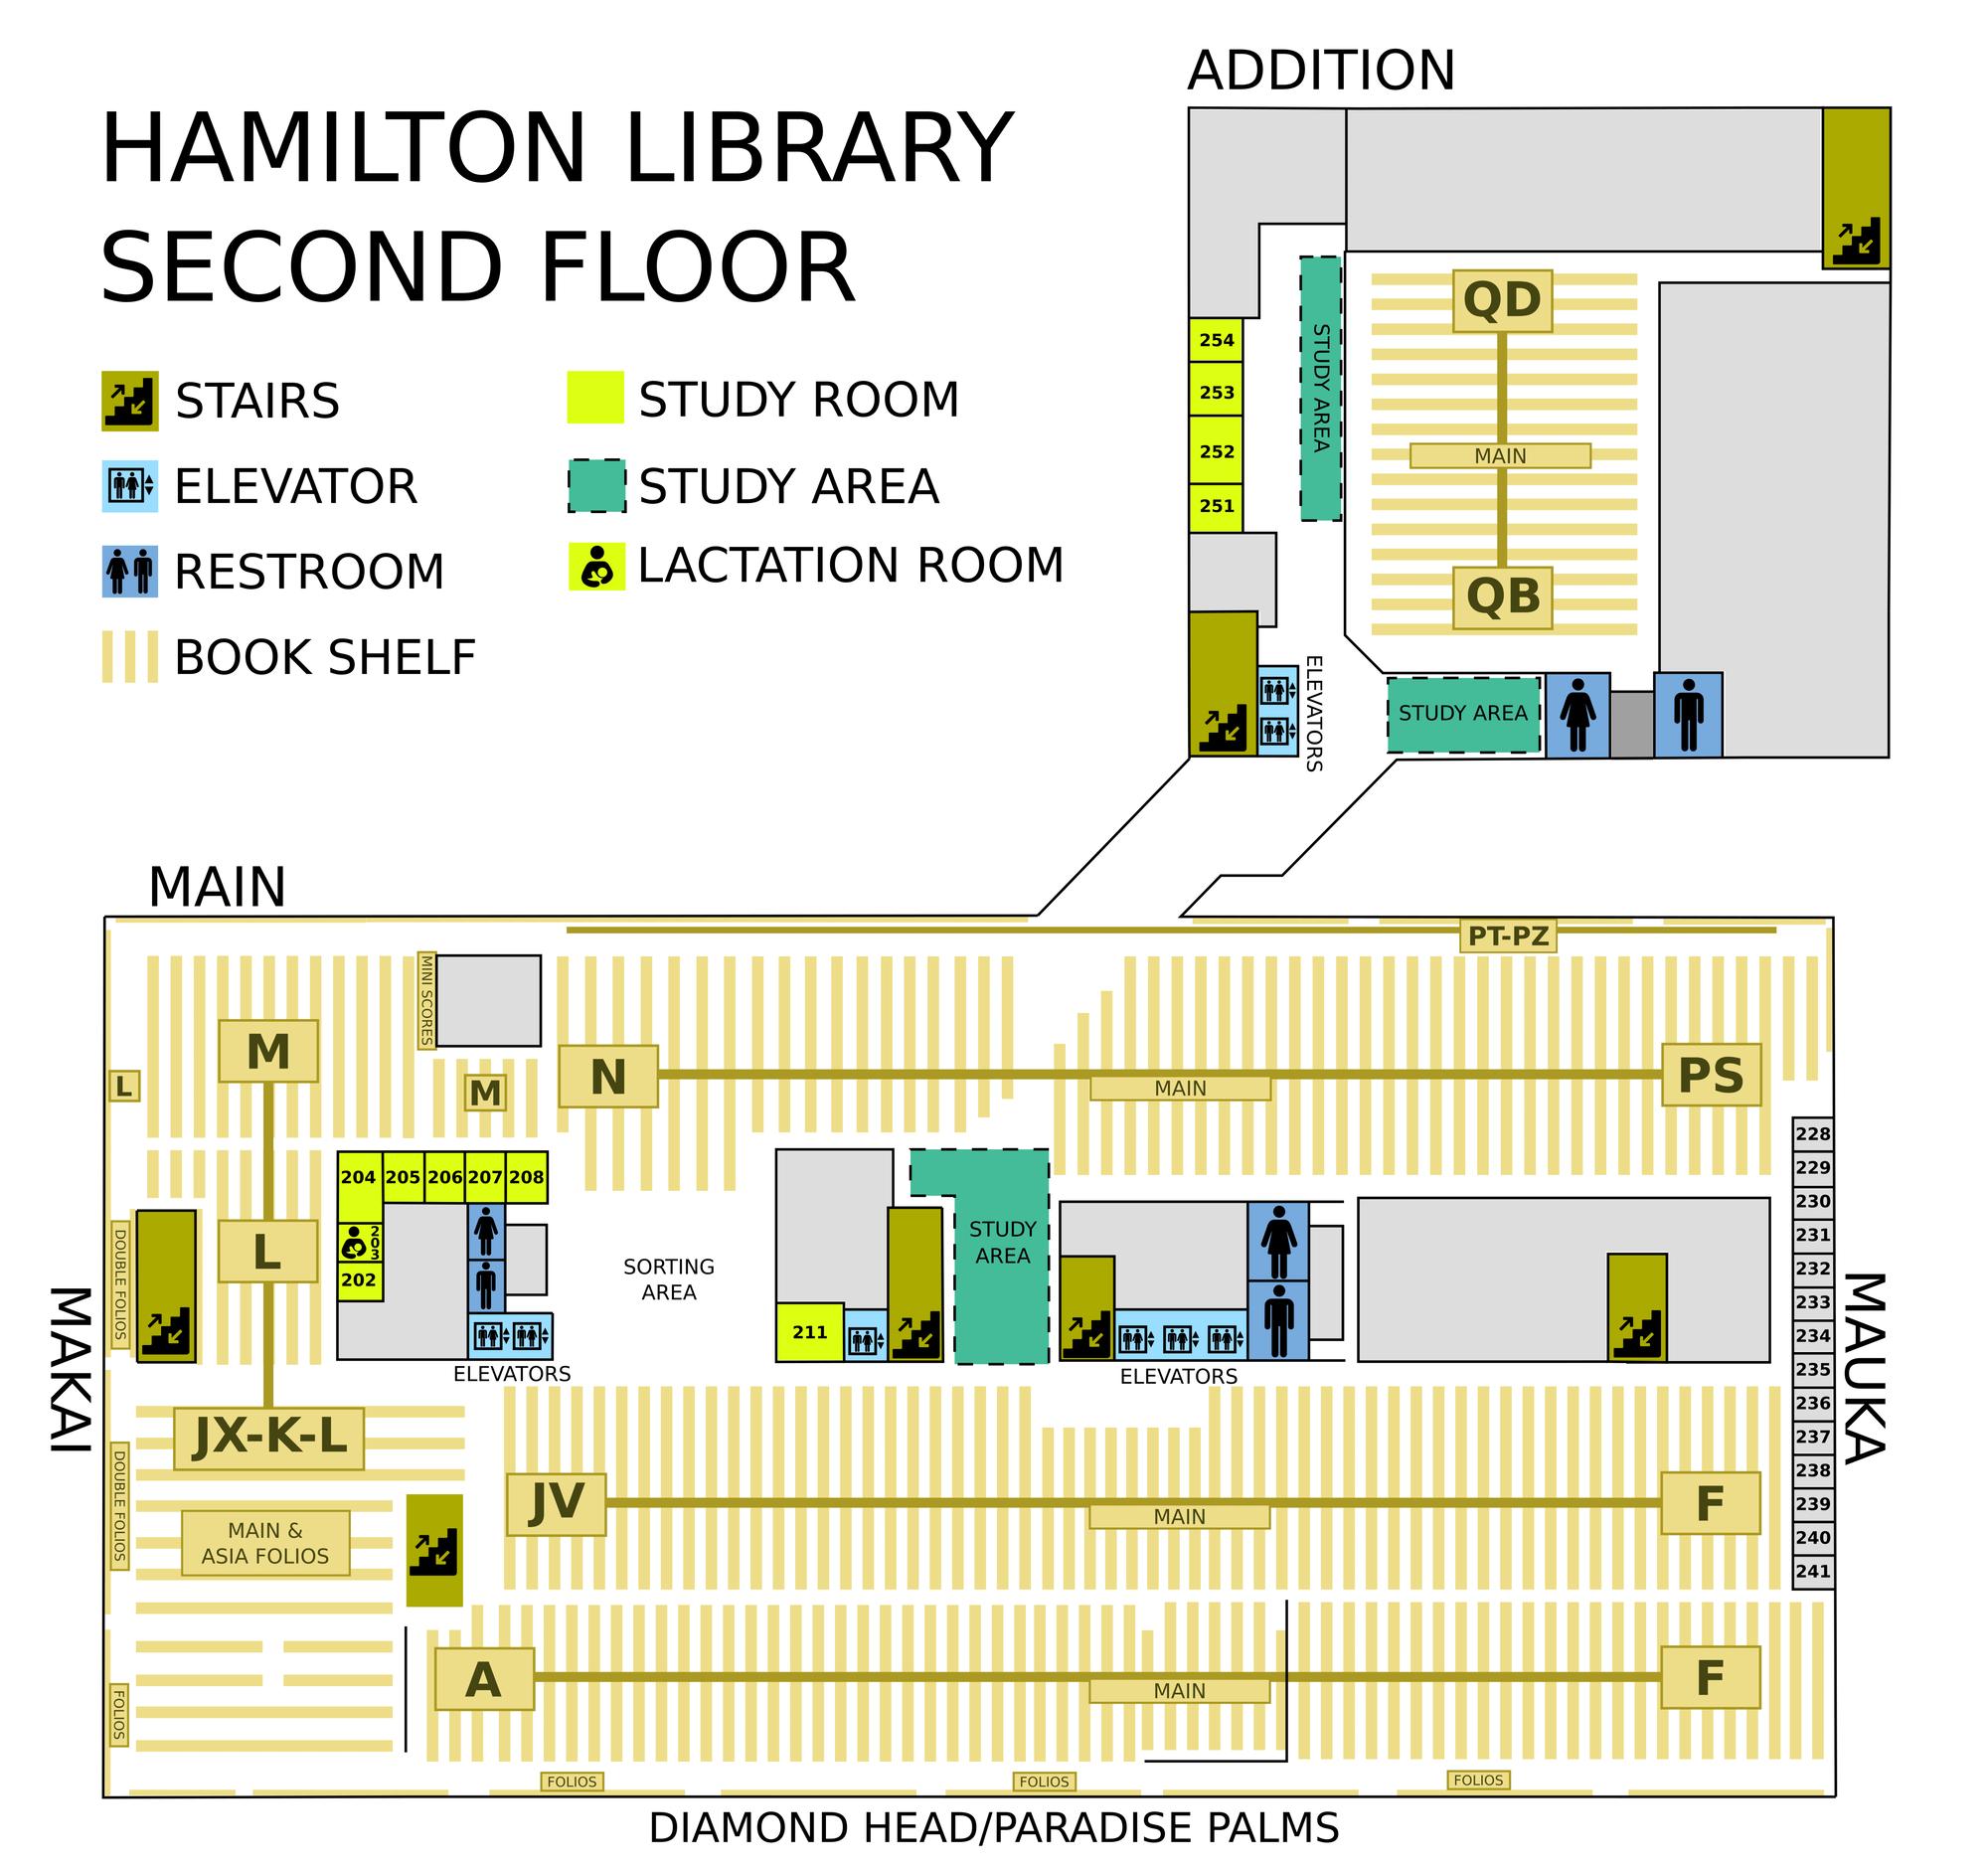 Hamilton second floor map